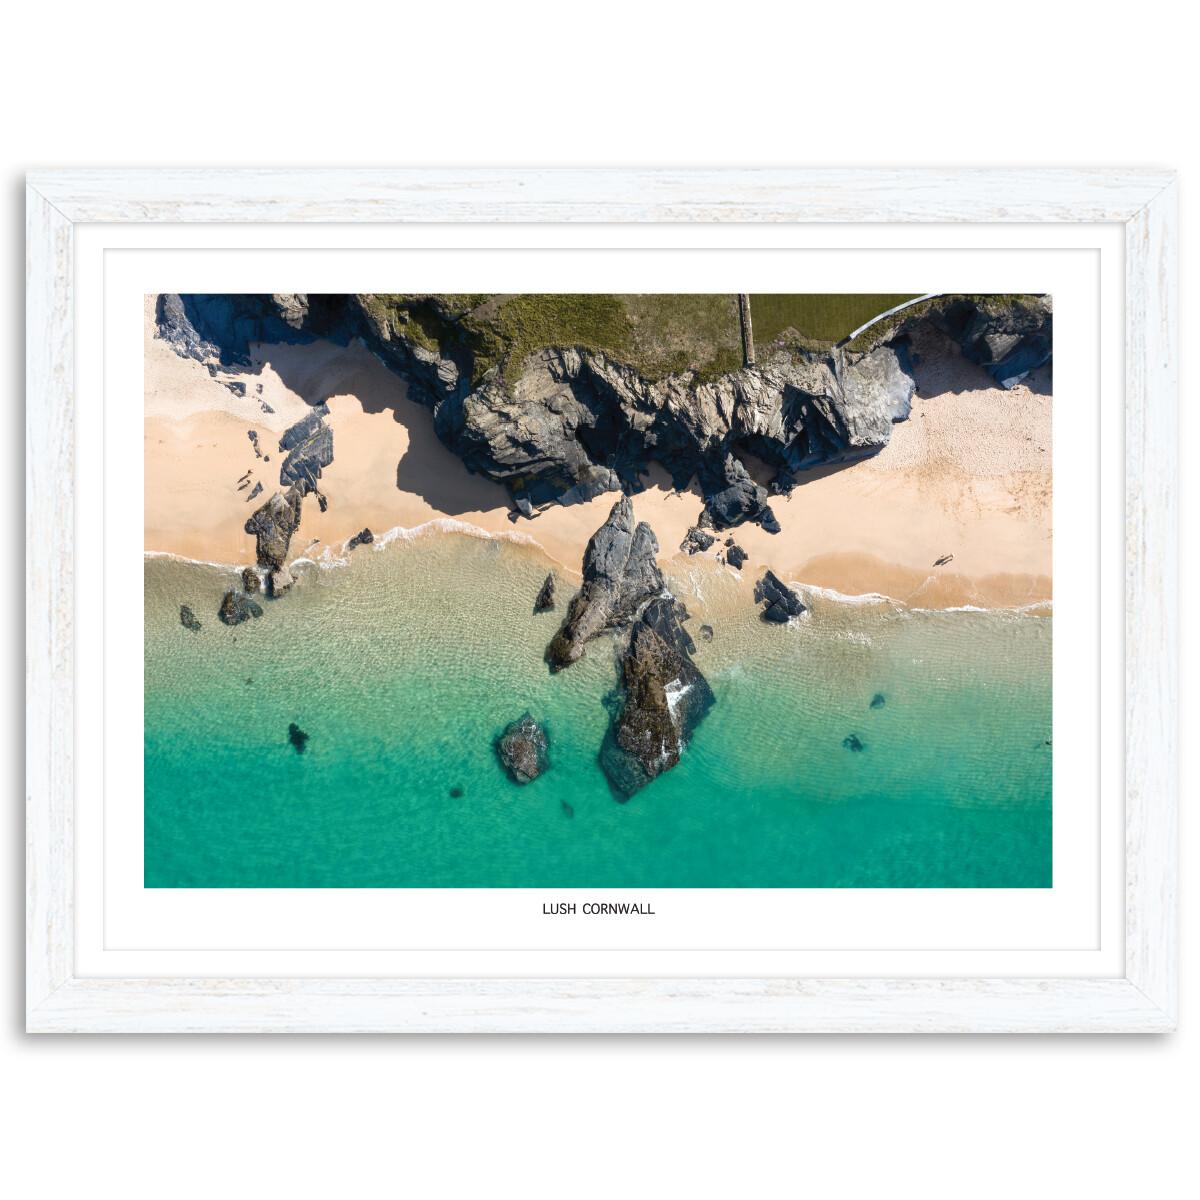 Lush Cornwall